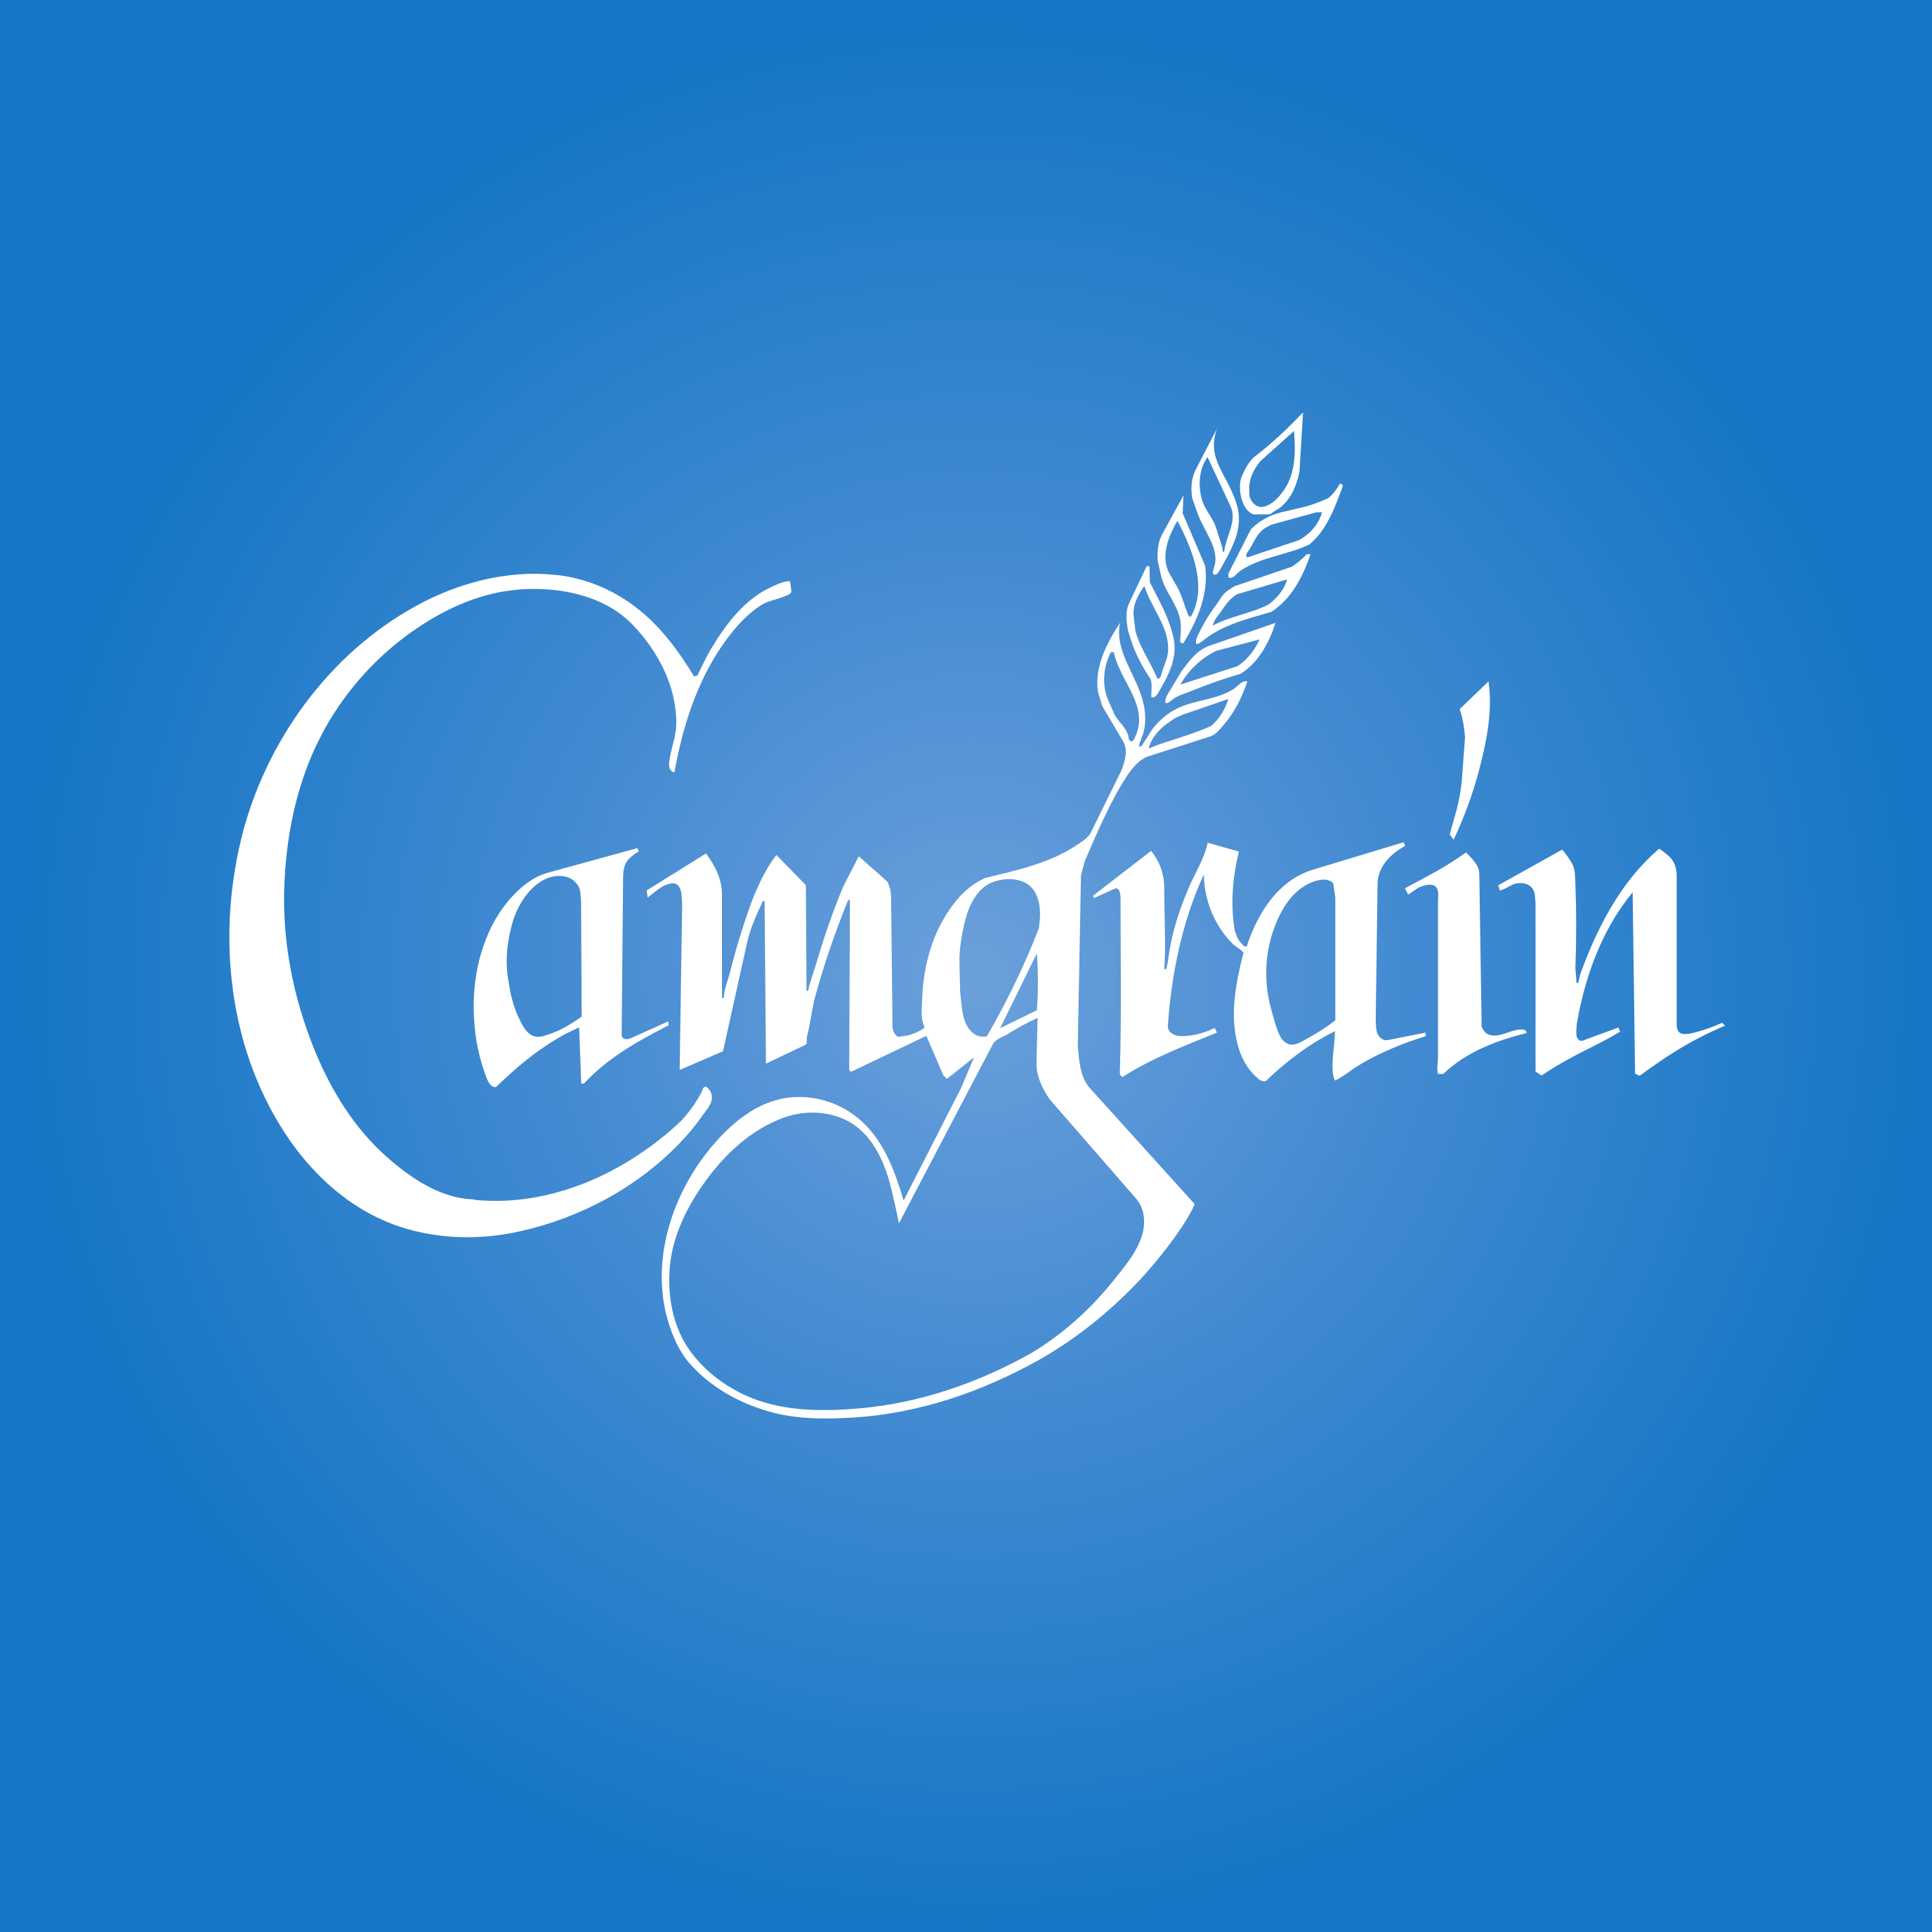 camgrain-blue